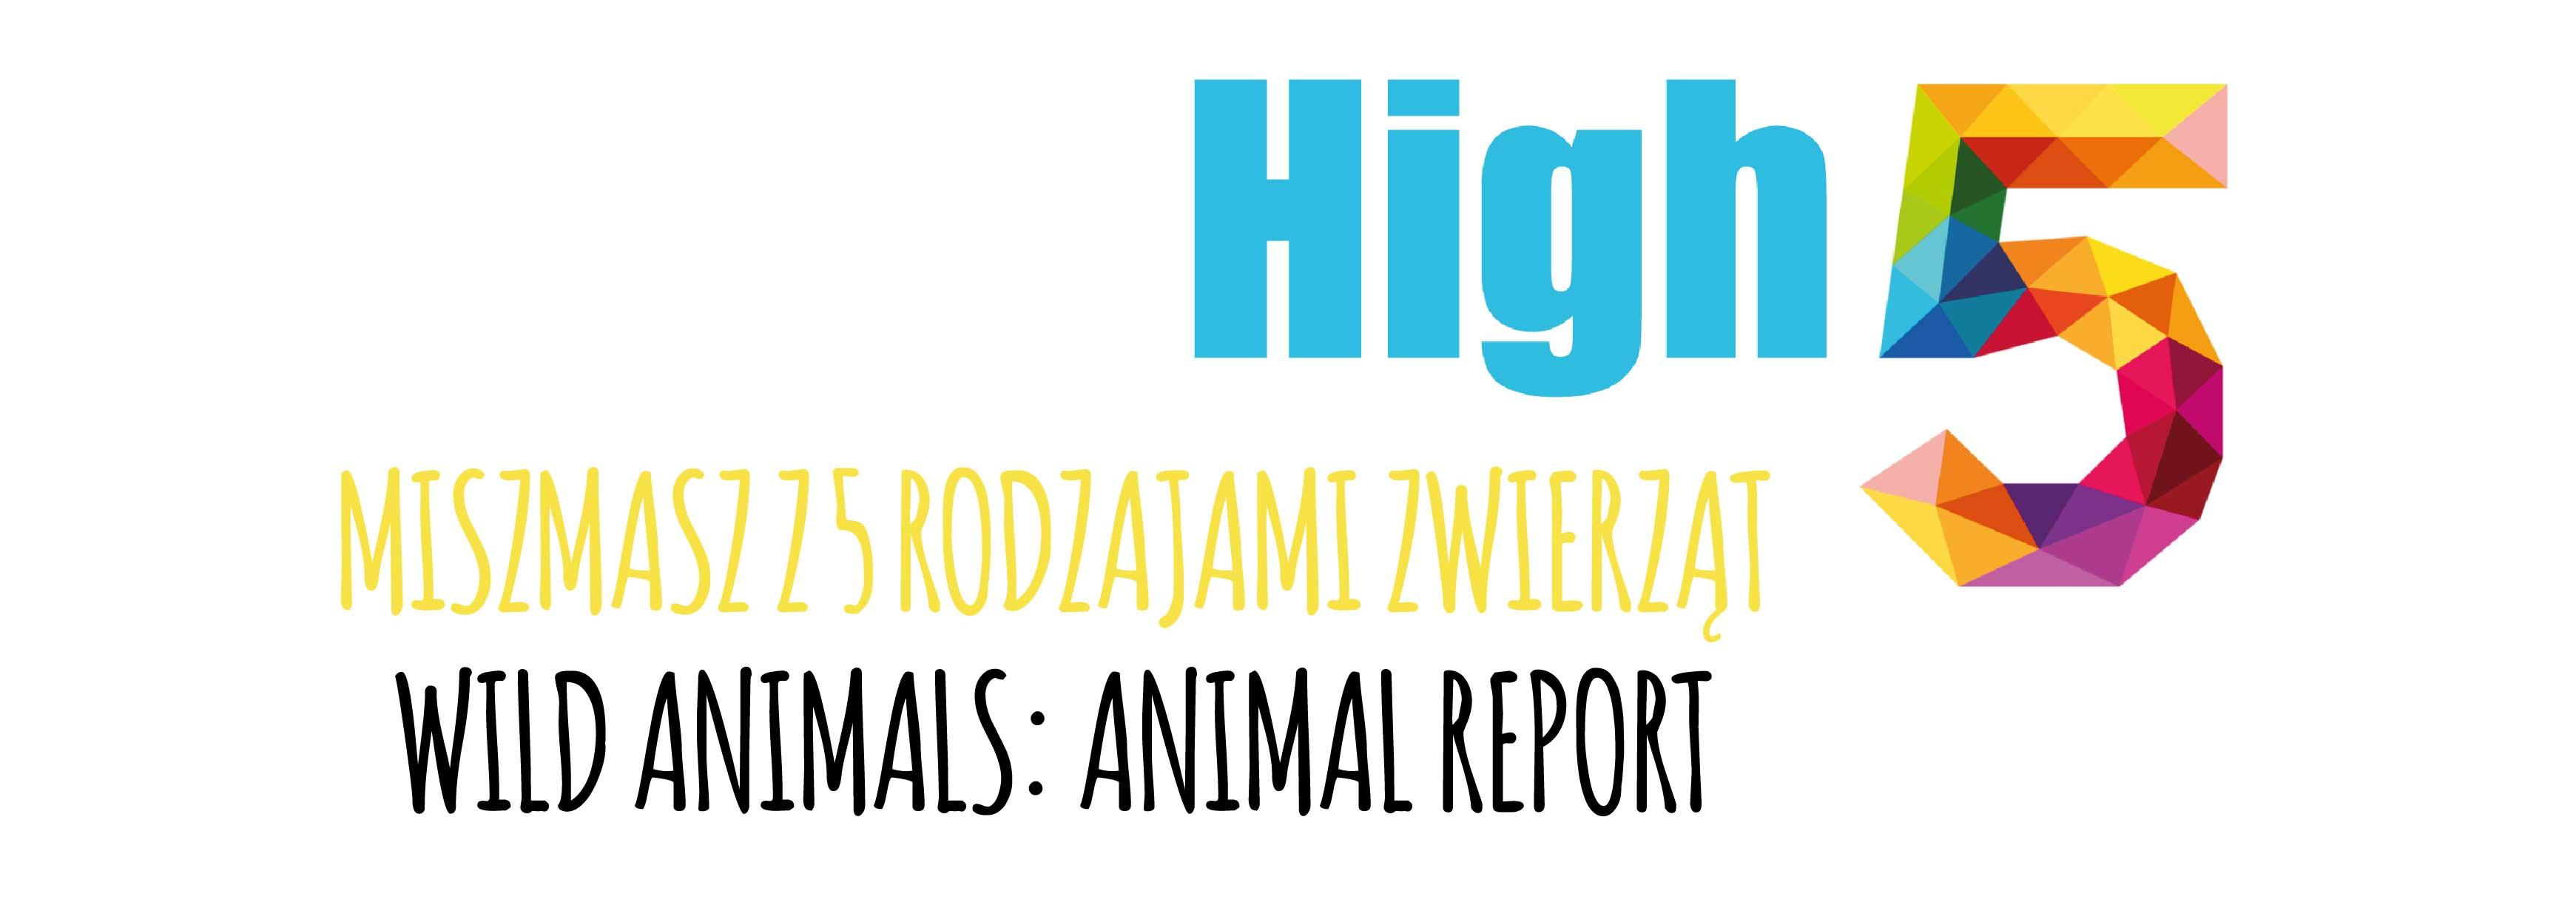 high 5 miszmasz wild-01